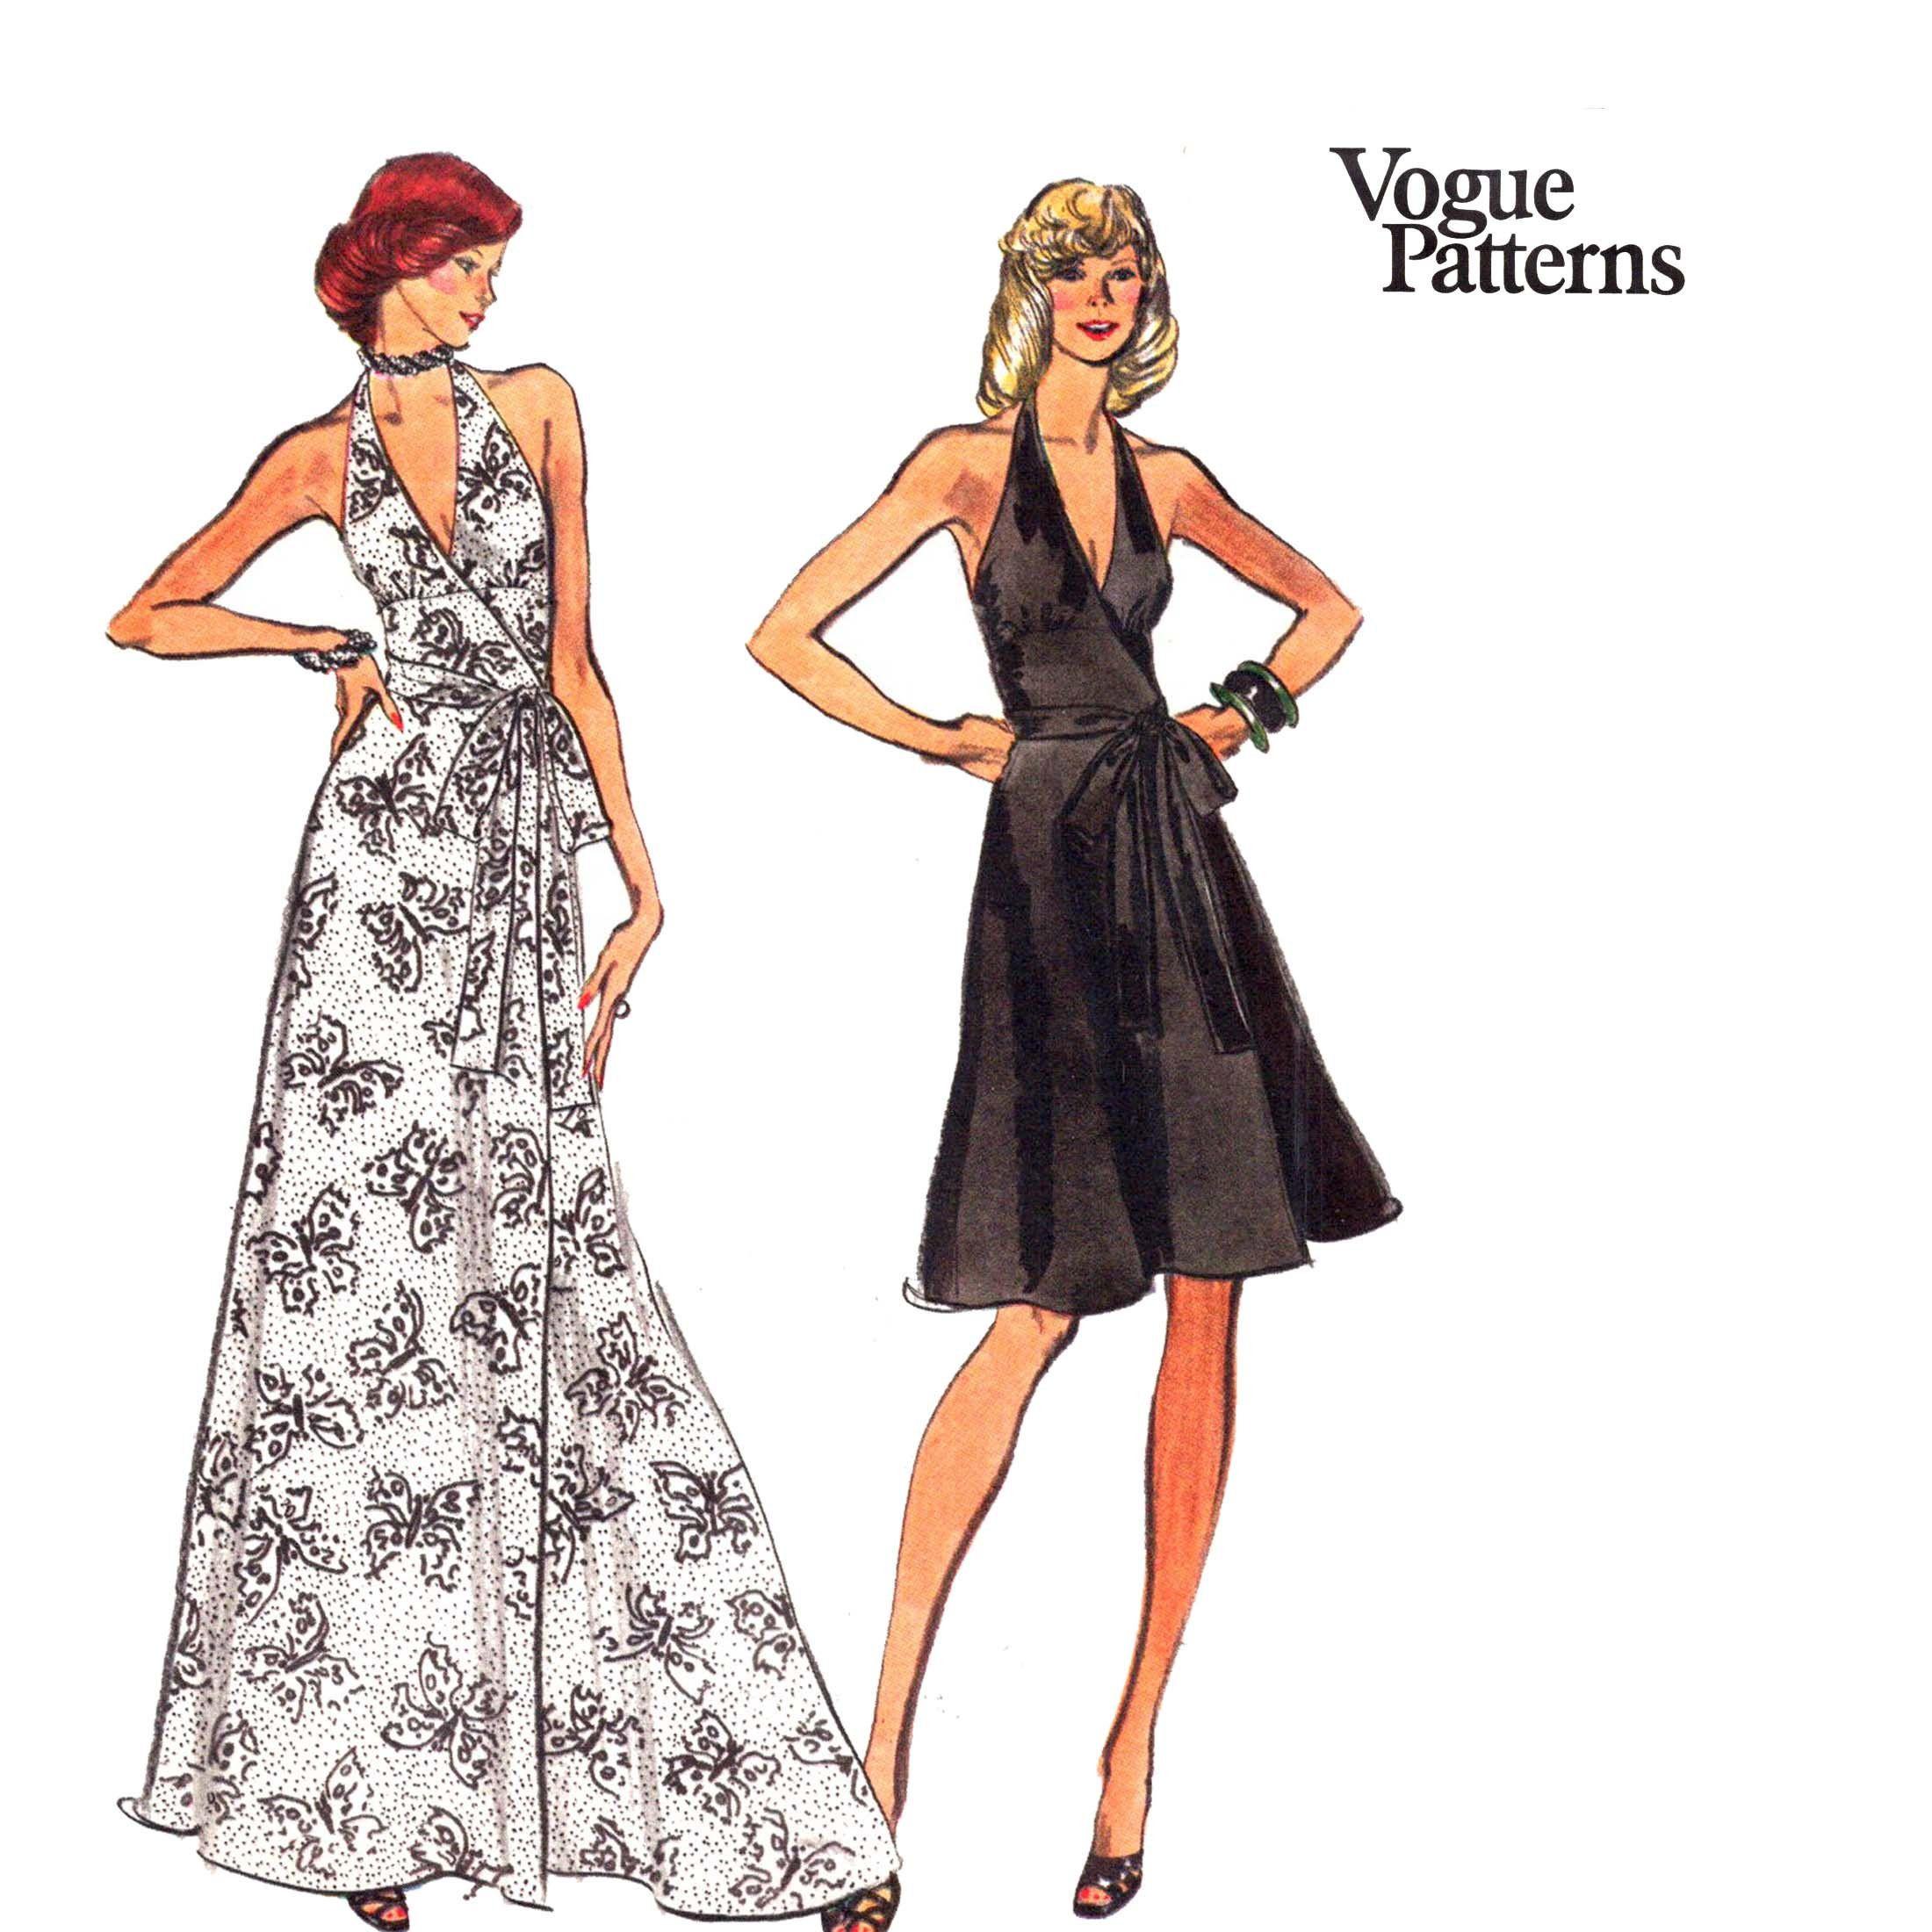 Dress Pattern Uncut Vogue Halter Dress Pattern 70s 36 28 38 Etsy In 2021 Maxi Dress Pattern Vogue Dress Patterns Halter Dress Pattern [ 2200 x 2200 Pixel ]